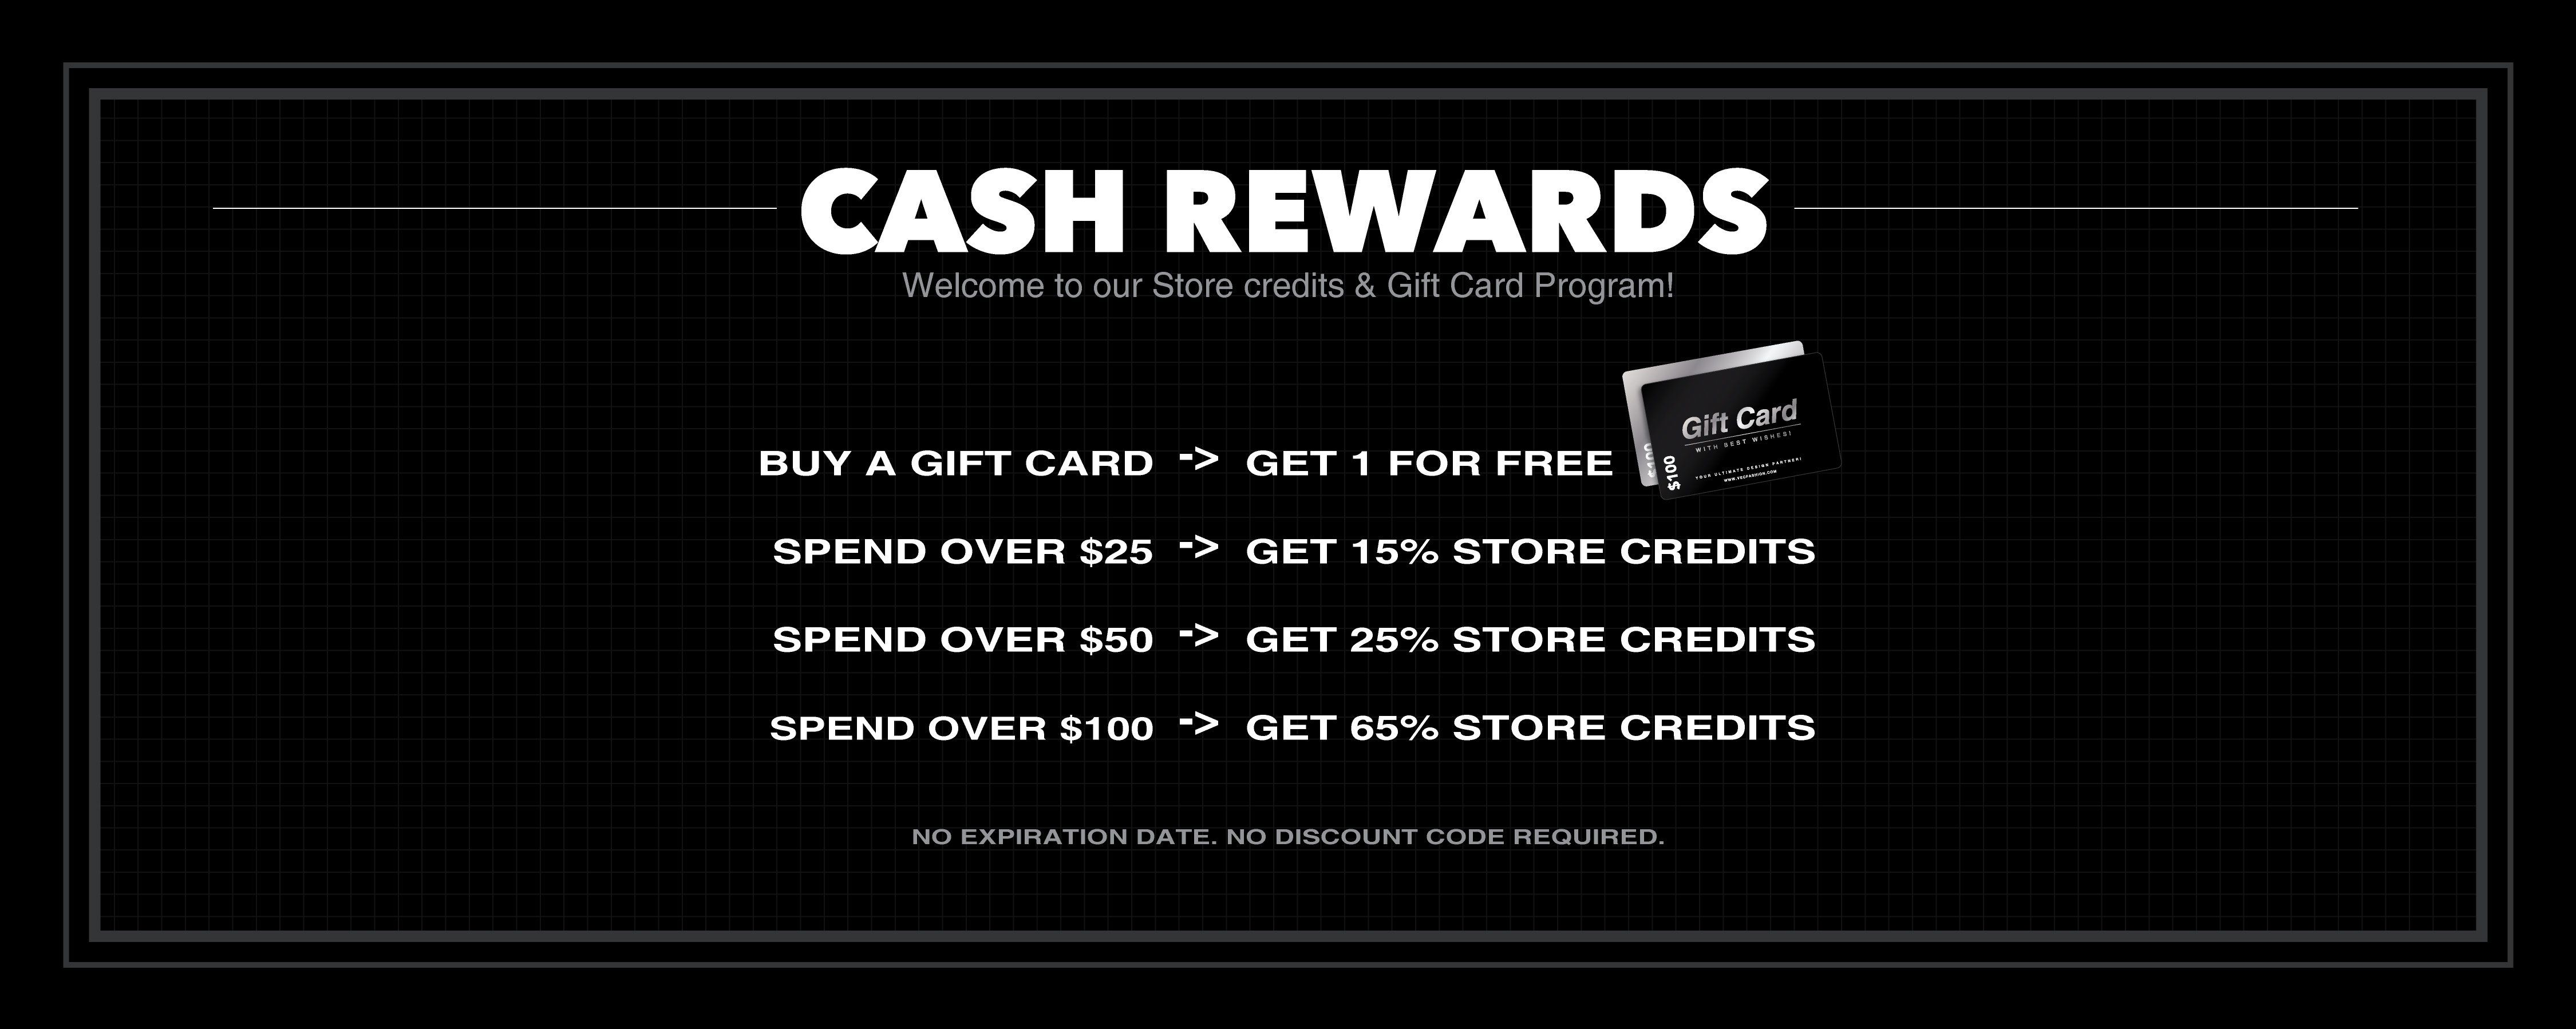 Cash rewards cash rewards customer loyalty program rewards